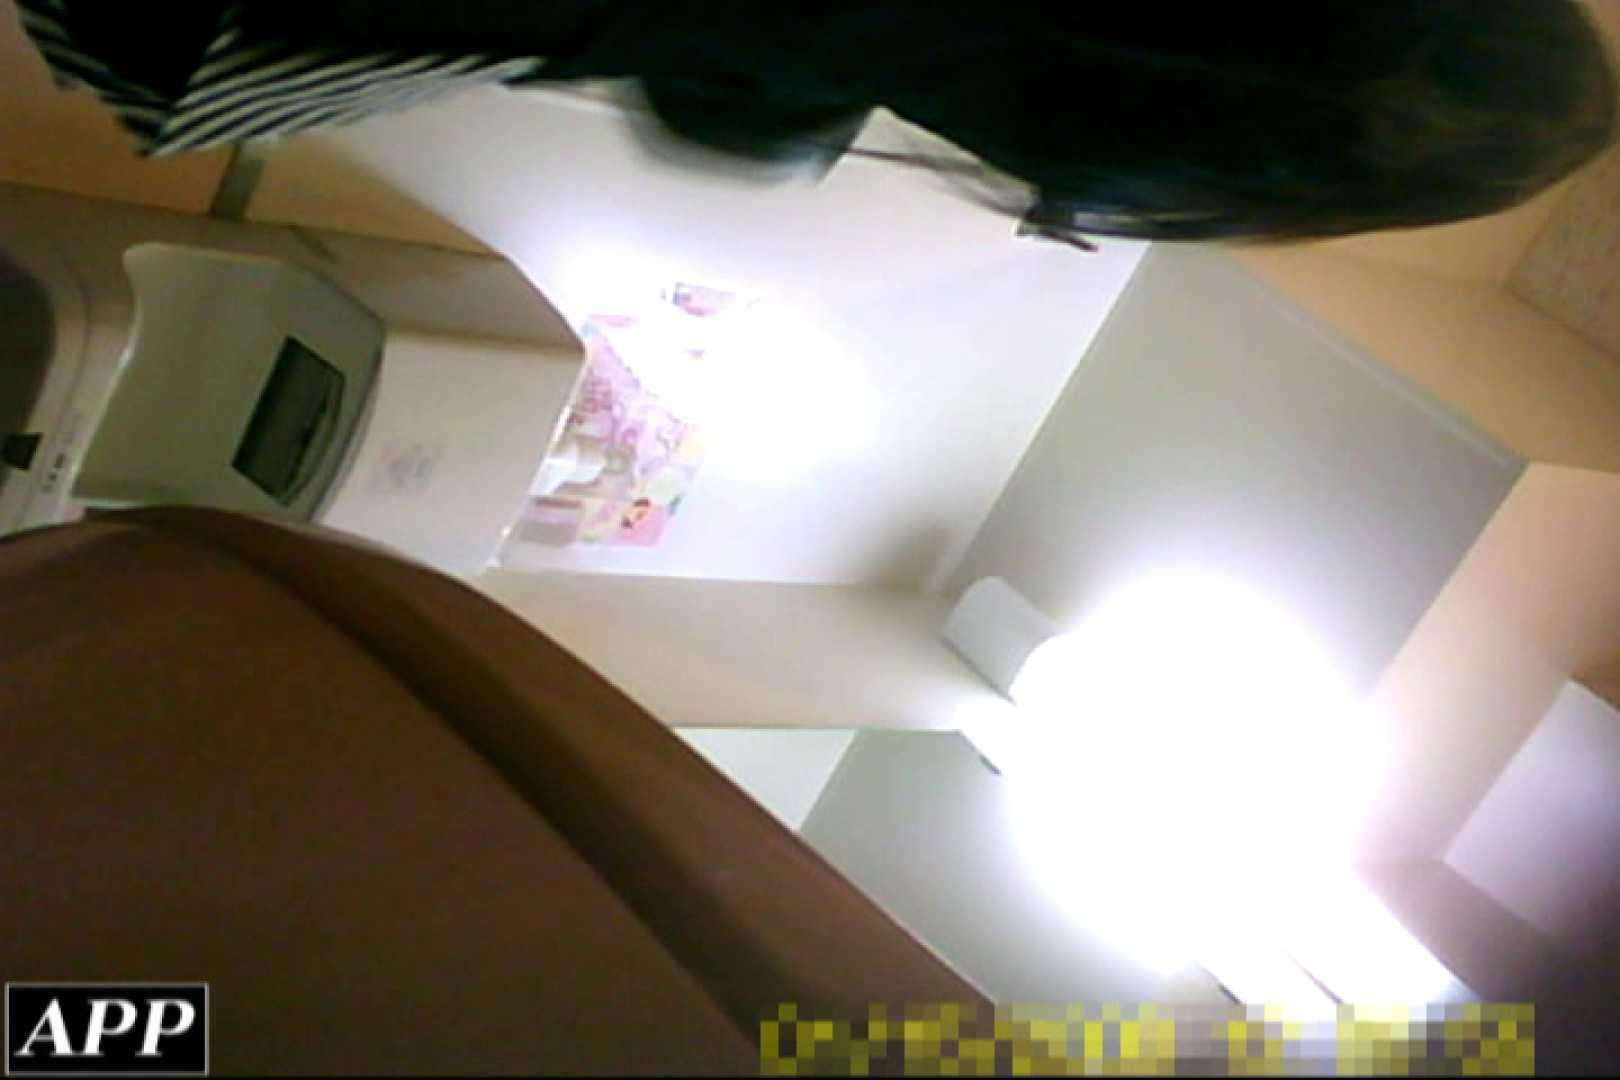 3視点洗面所 vol.092 洗面所 | OLセックス  101画像 11